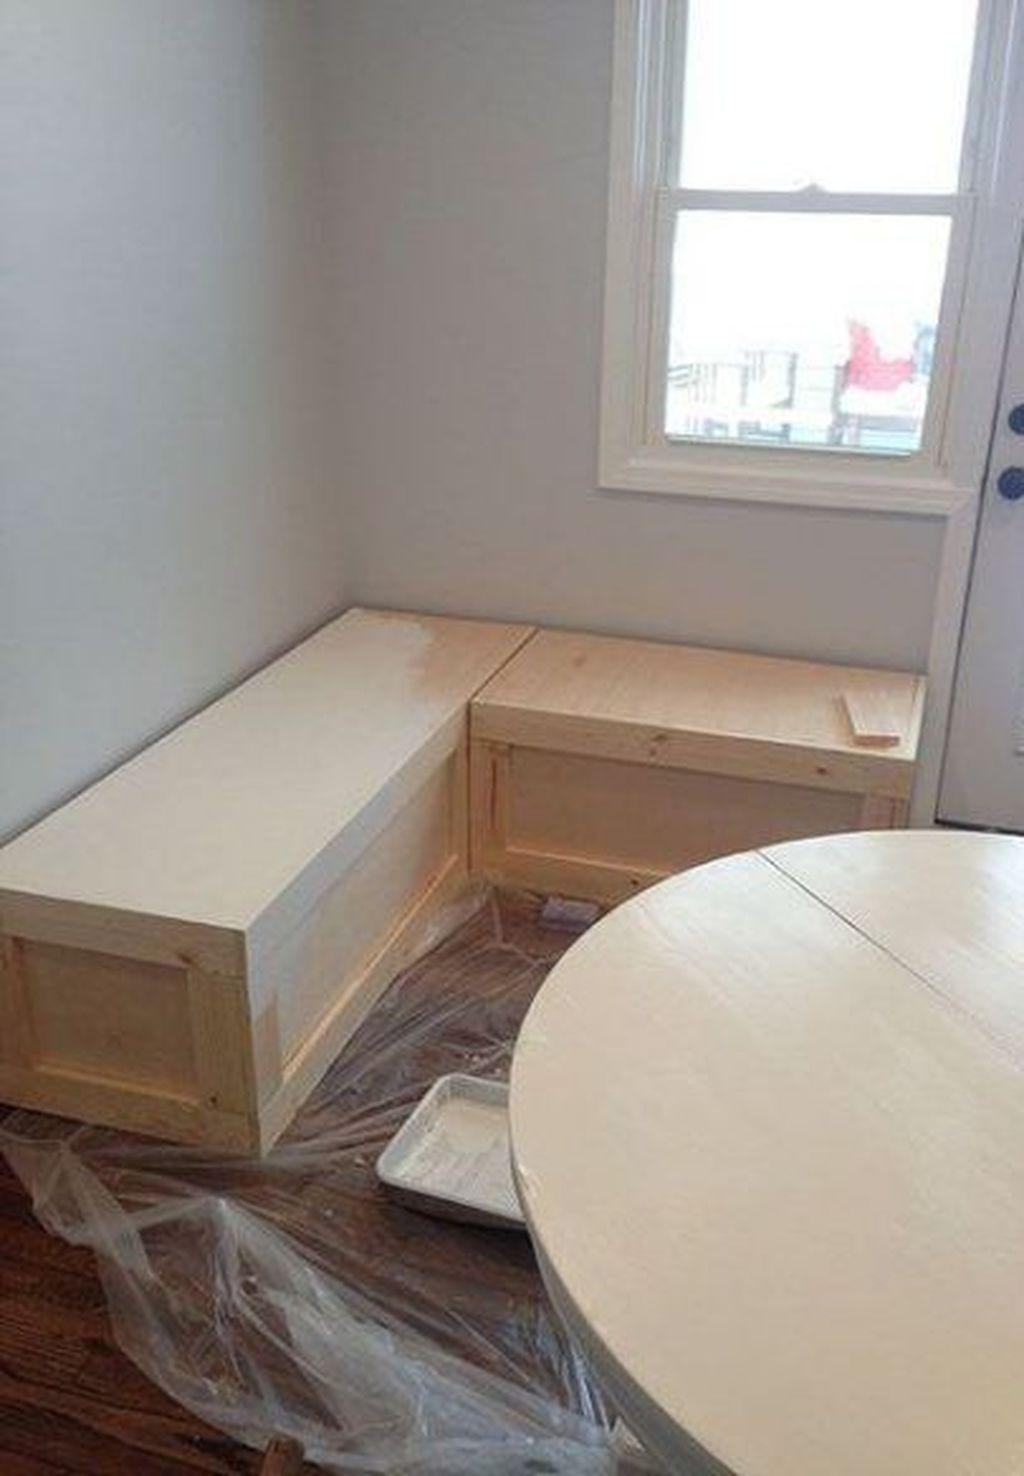 34 Trendy Diy Corner Bench Ideas That Can Be Inspire Everyone Breakfast Nook Furniture Nook Furniture Corner Bench With Storage